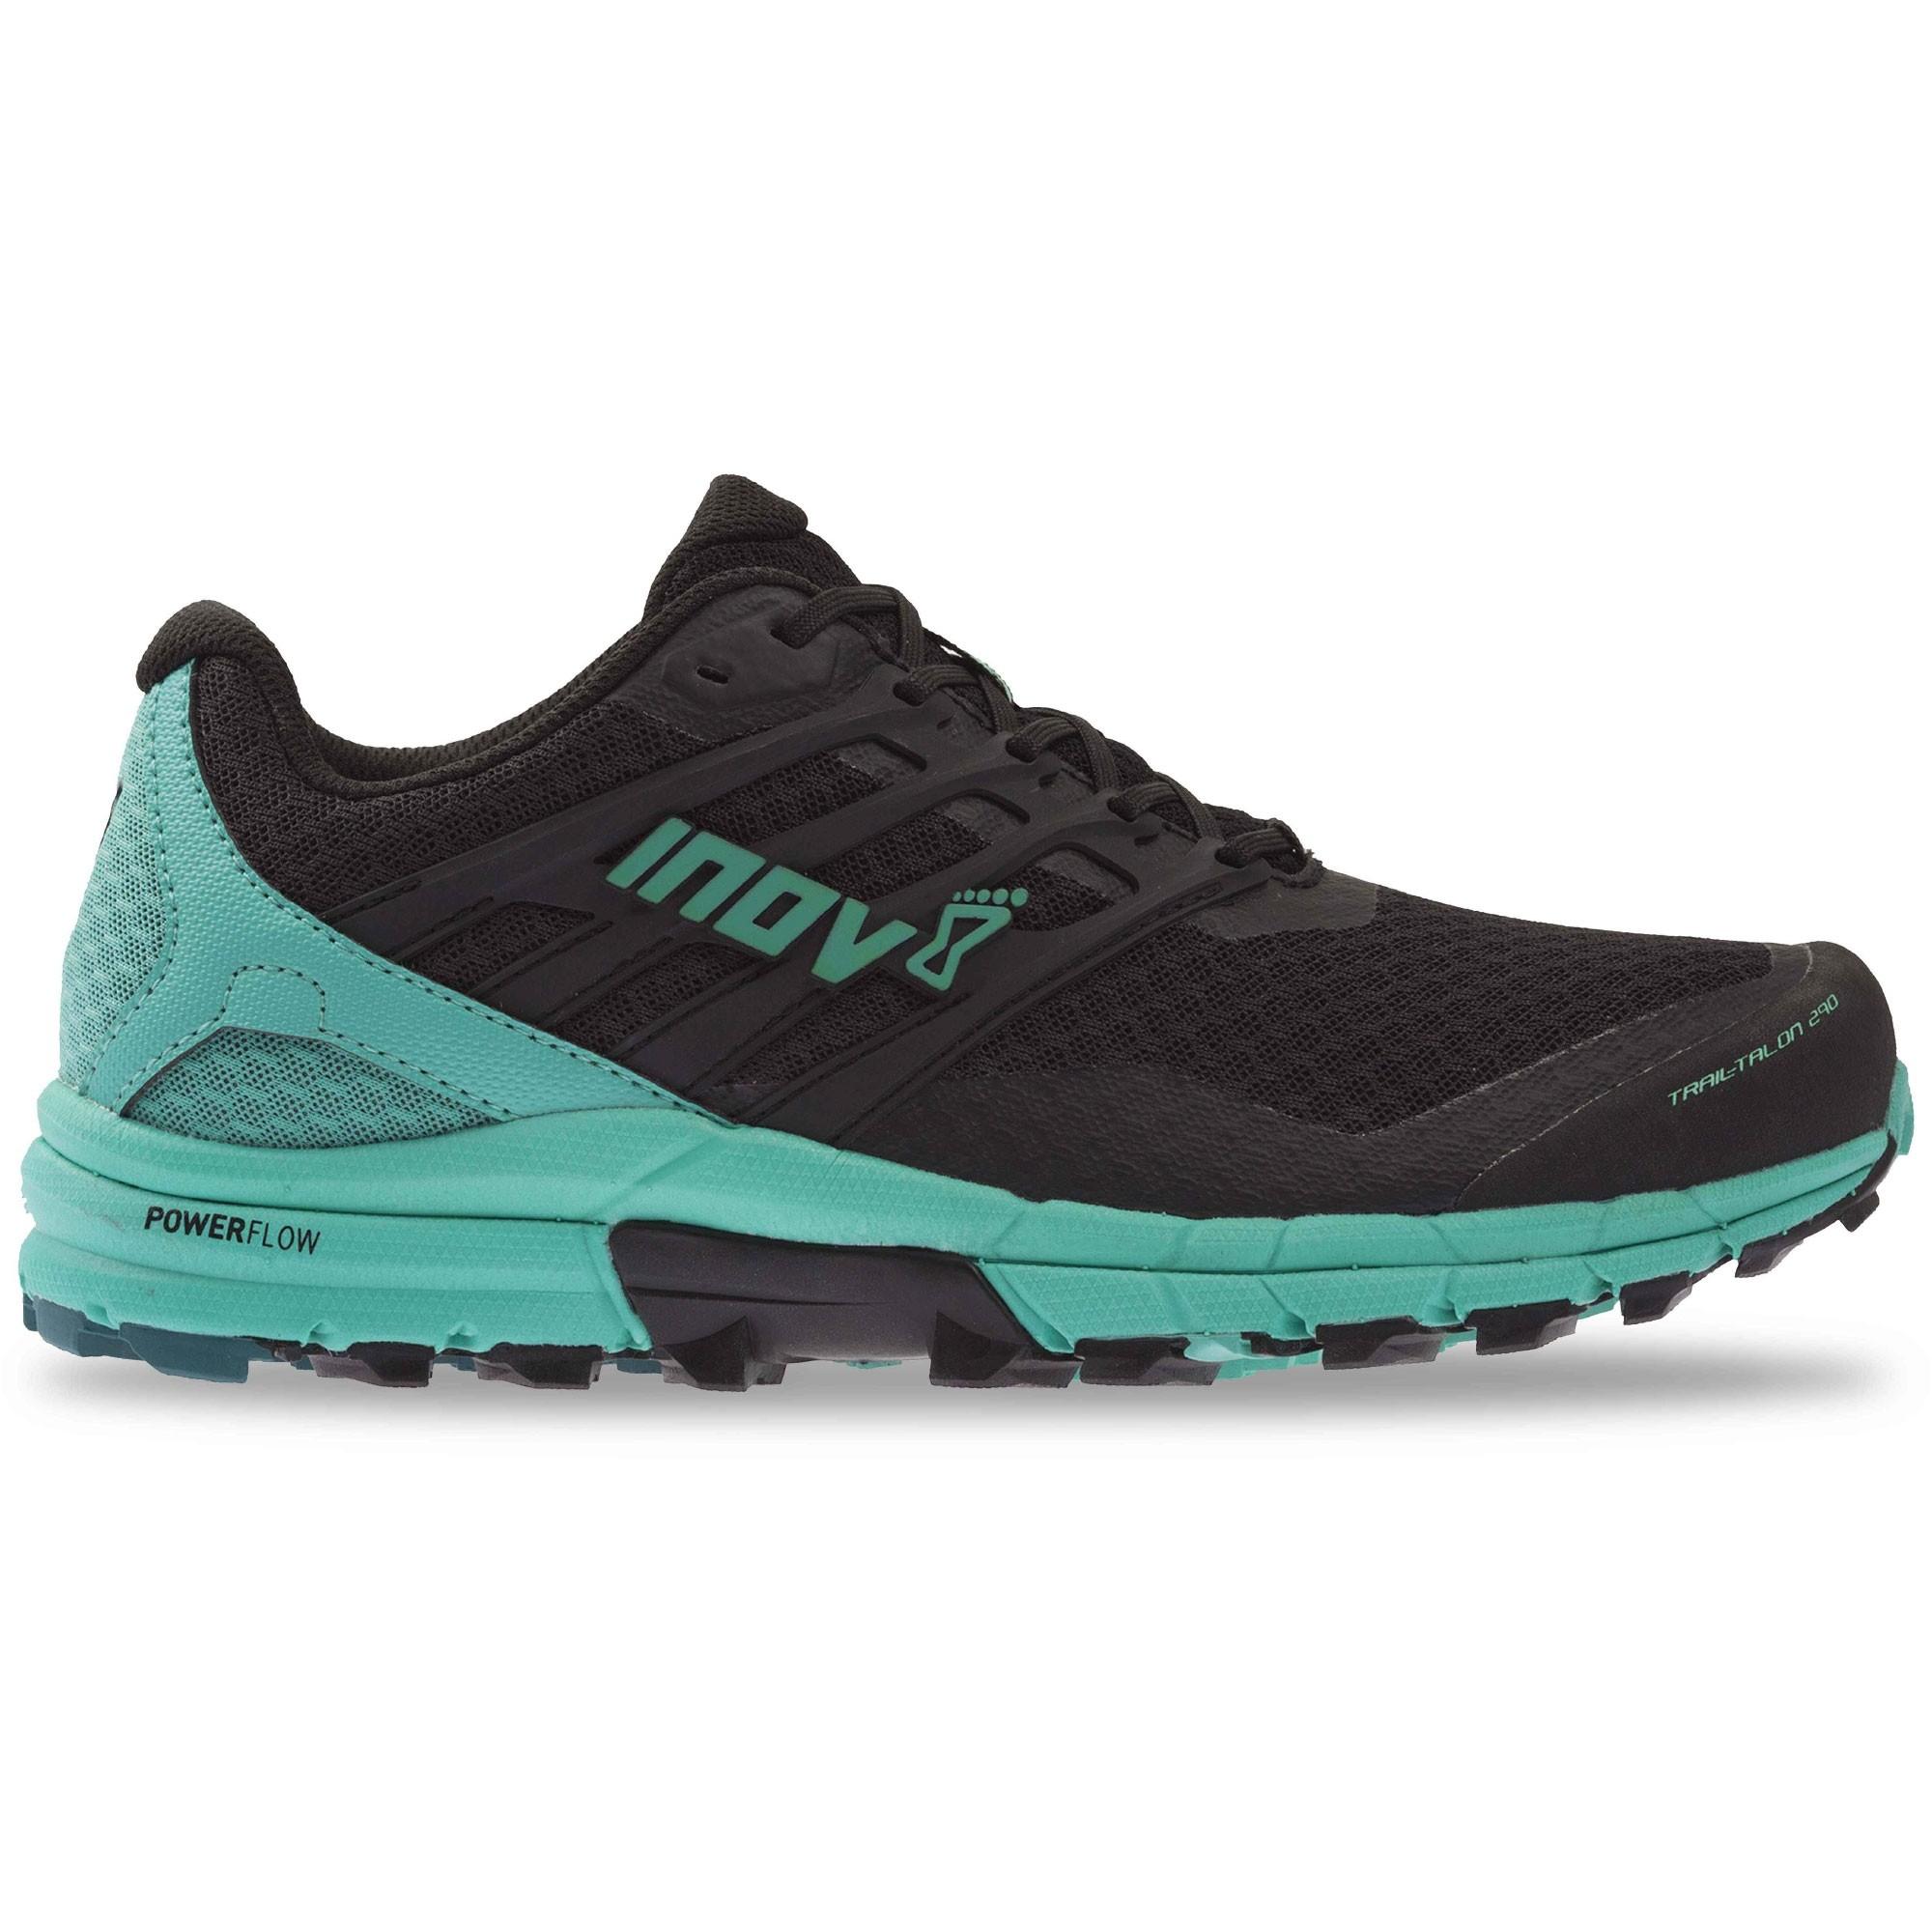 Inov8 Trail Talon 290 Trail Running Shoes - Black/Teal - Side 2